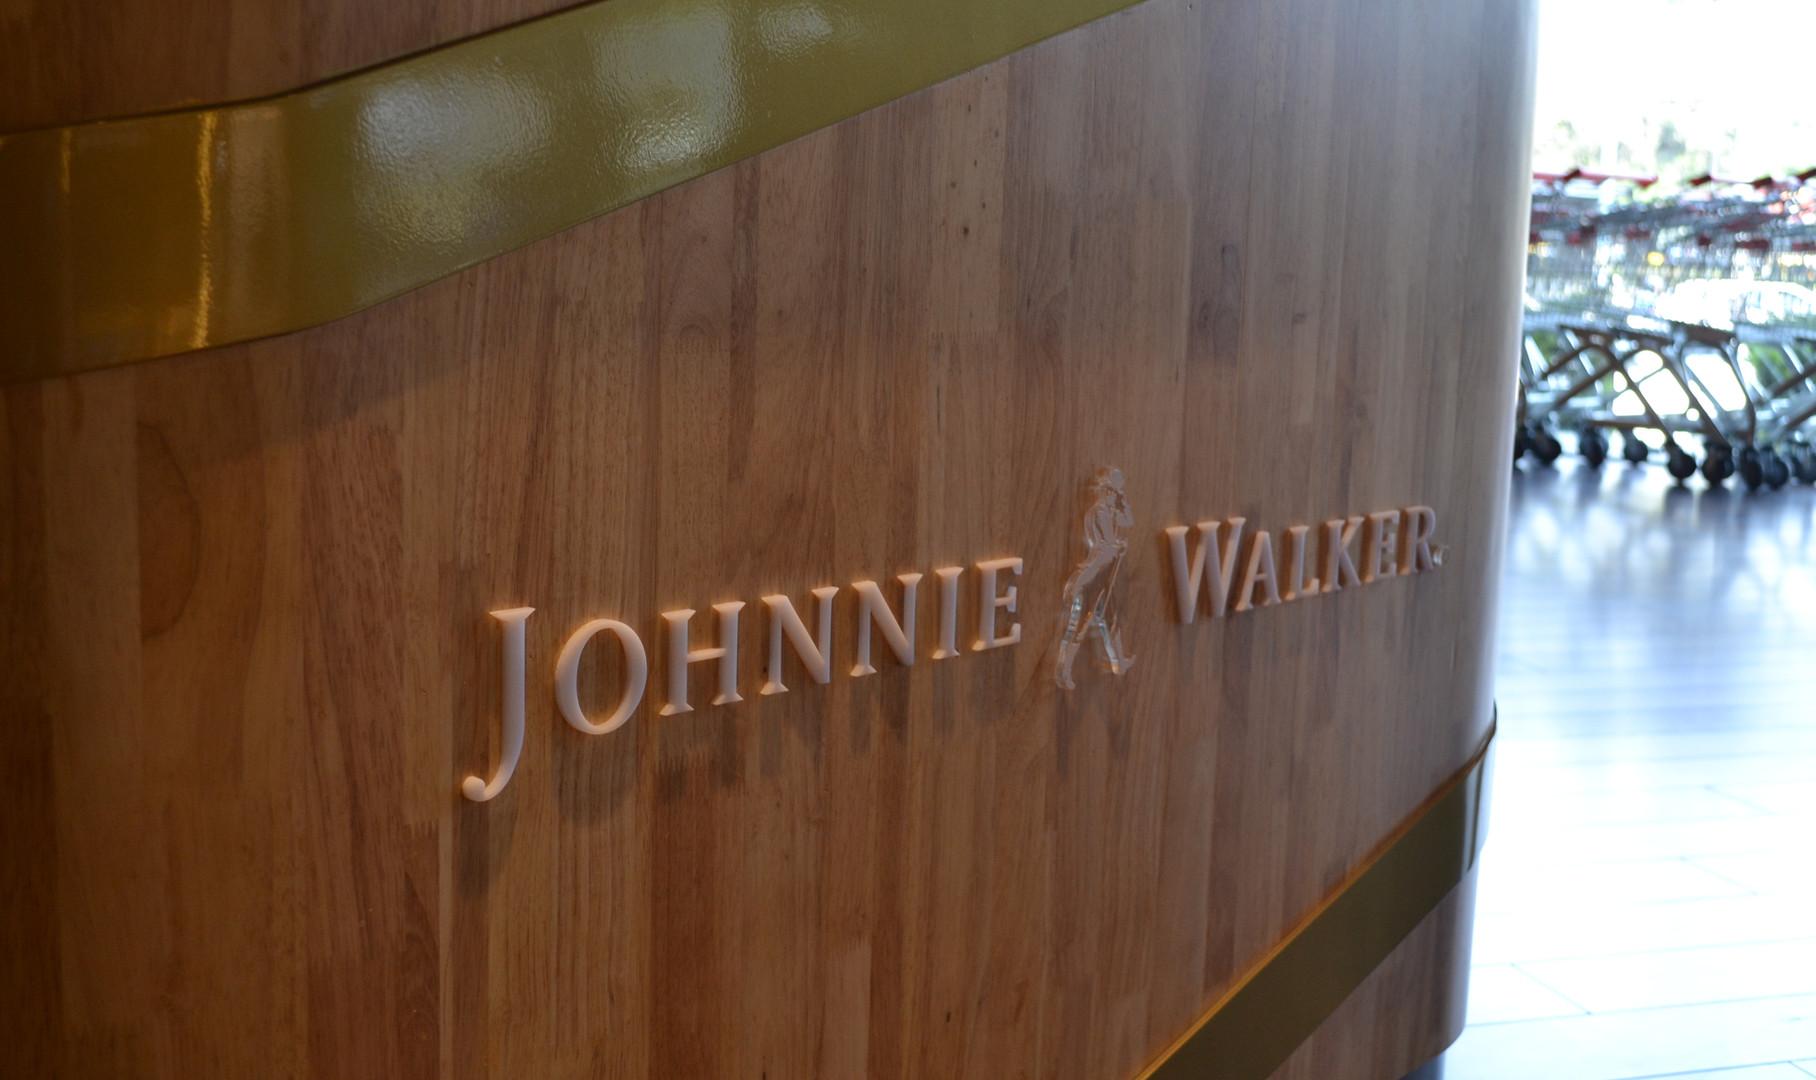 Johnnie Walker Gift Station - details